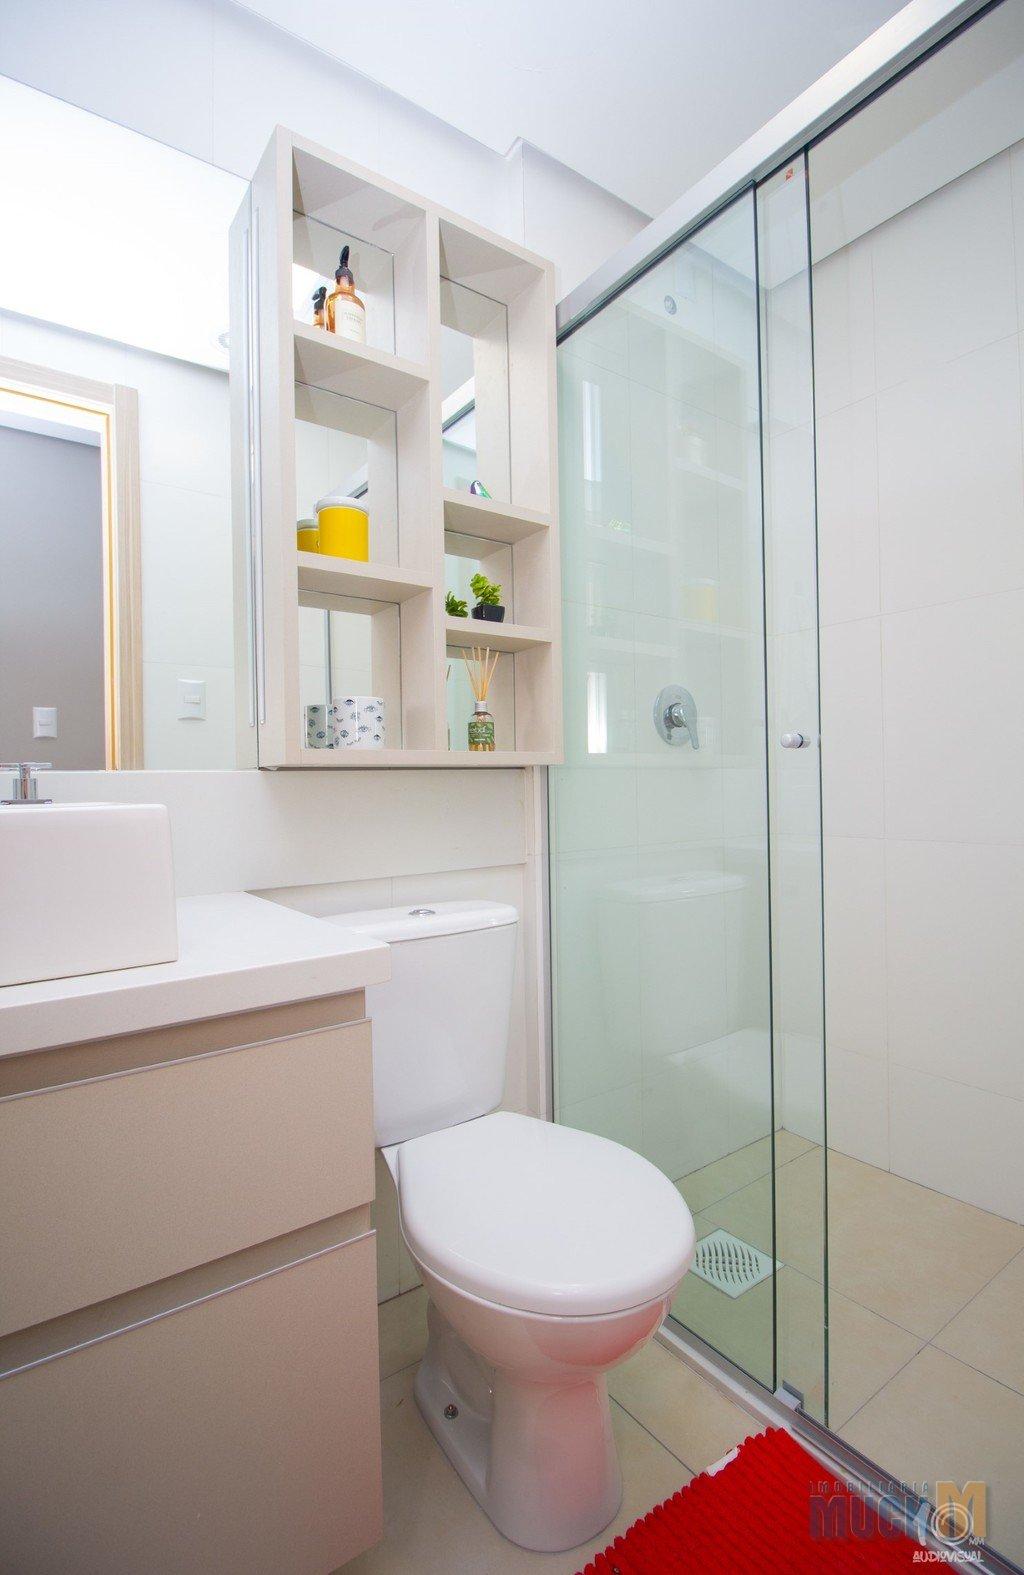 075_banheiro.jpg